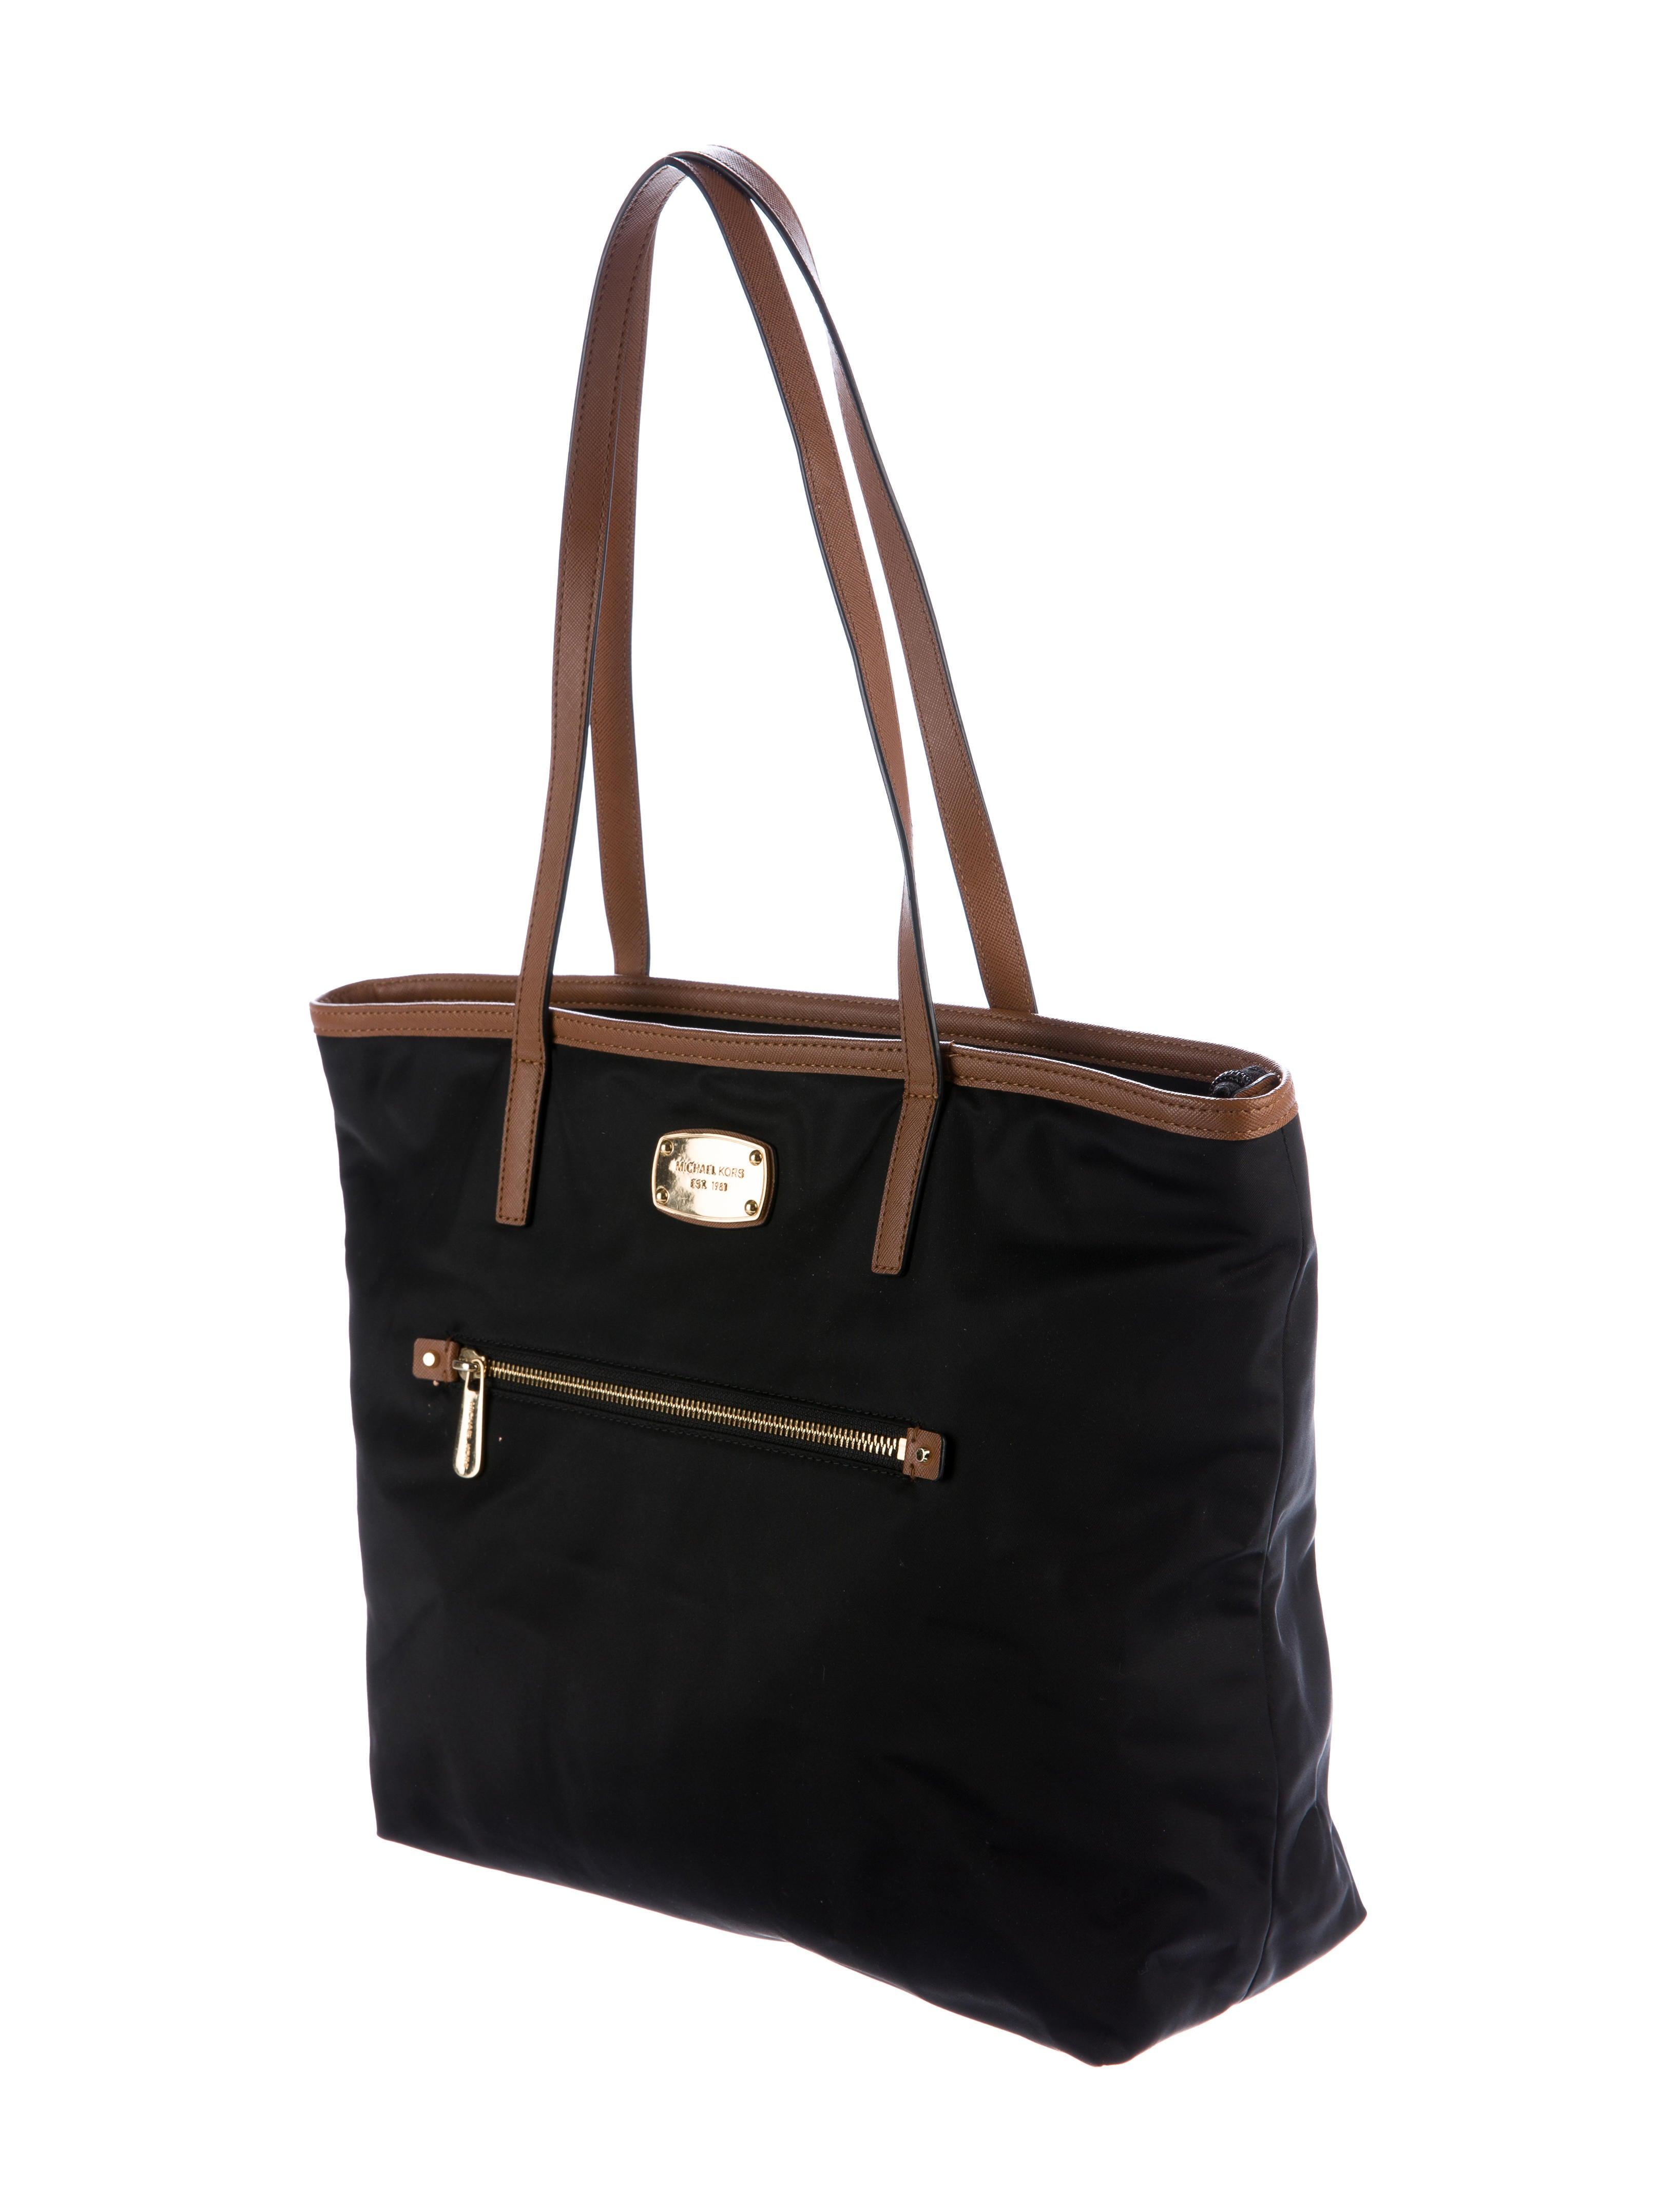 Bolsa Michael Kors Nylon : Michael kors kempton nylon tote handbags